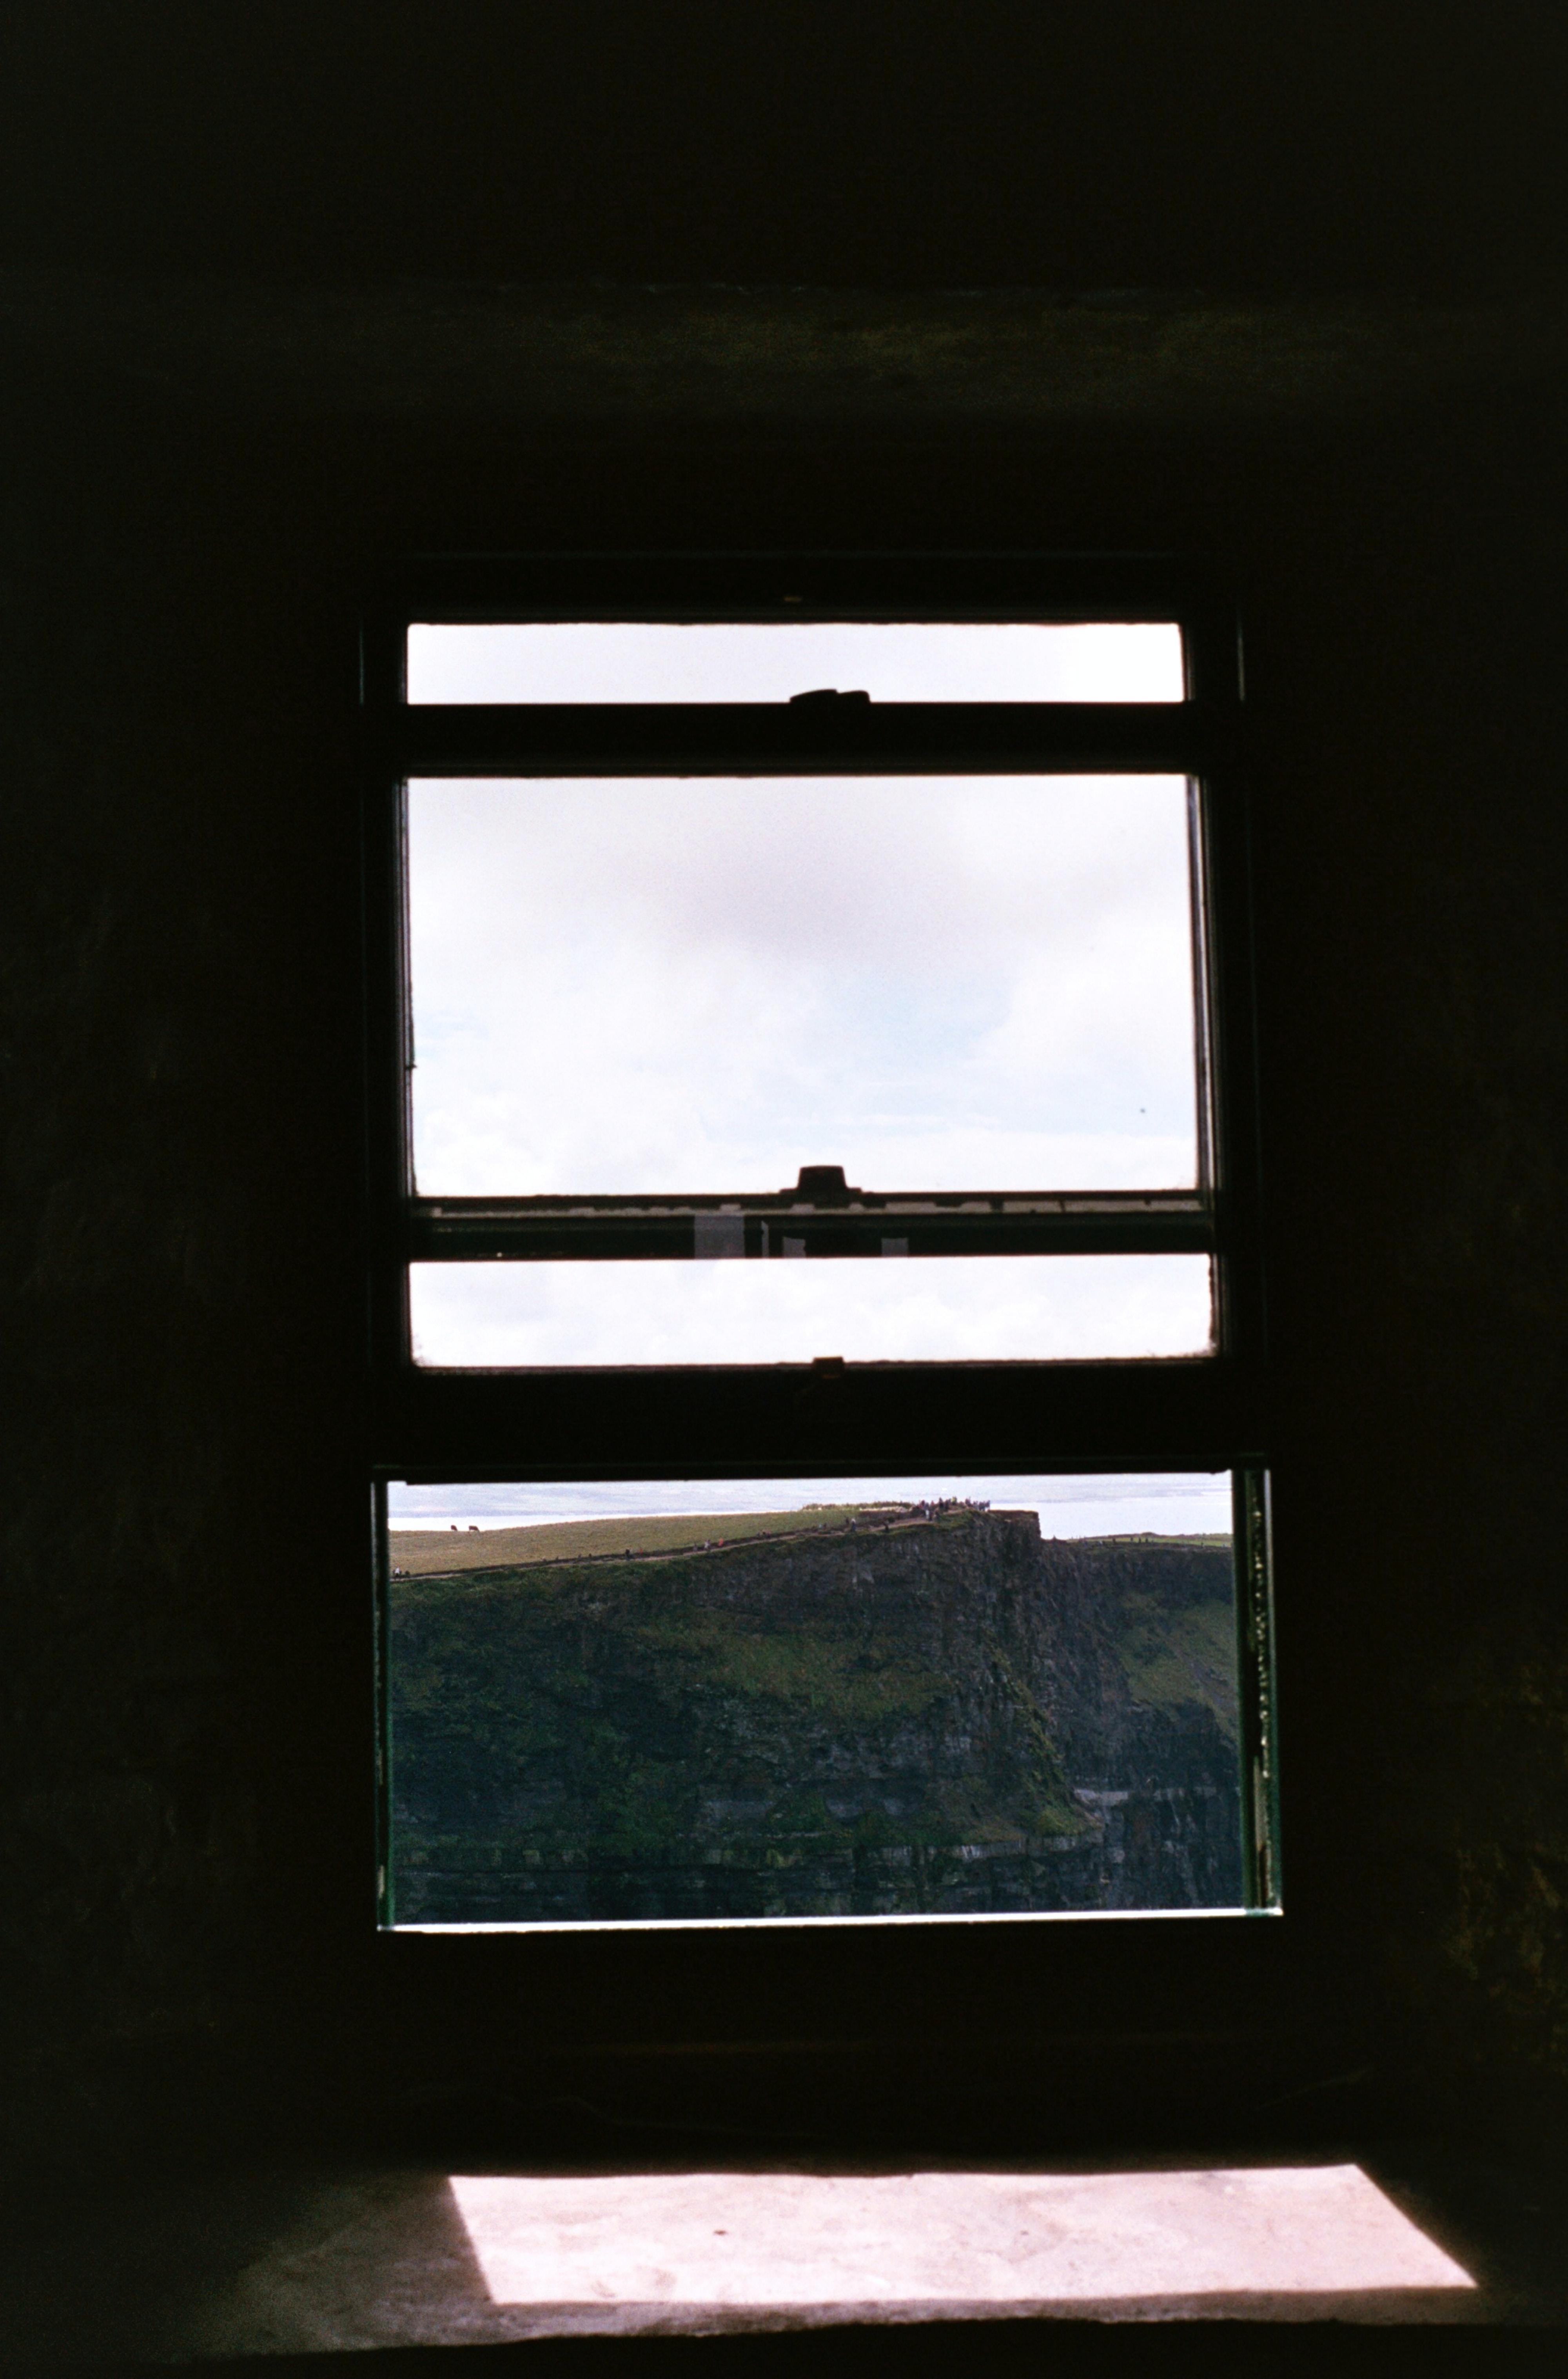 close-up photo of windowpane